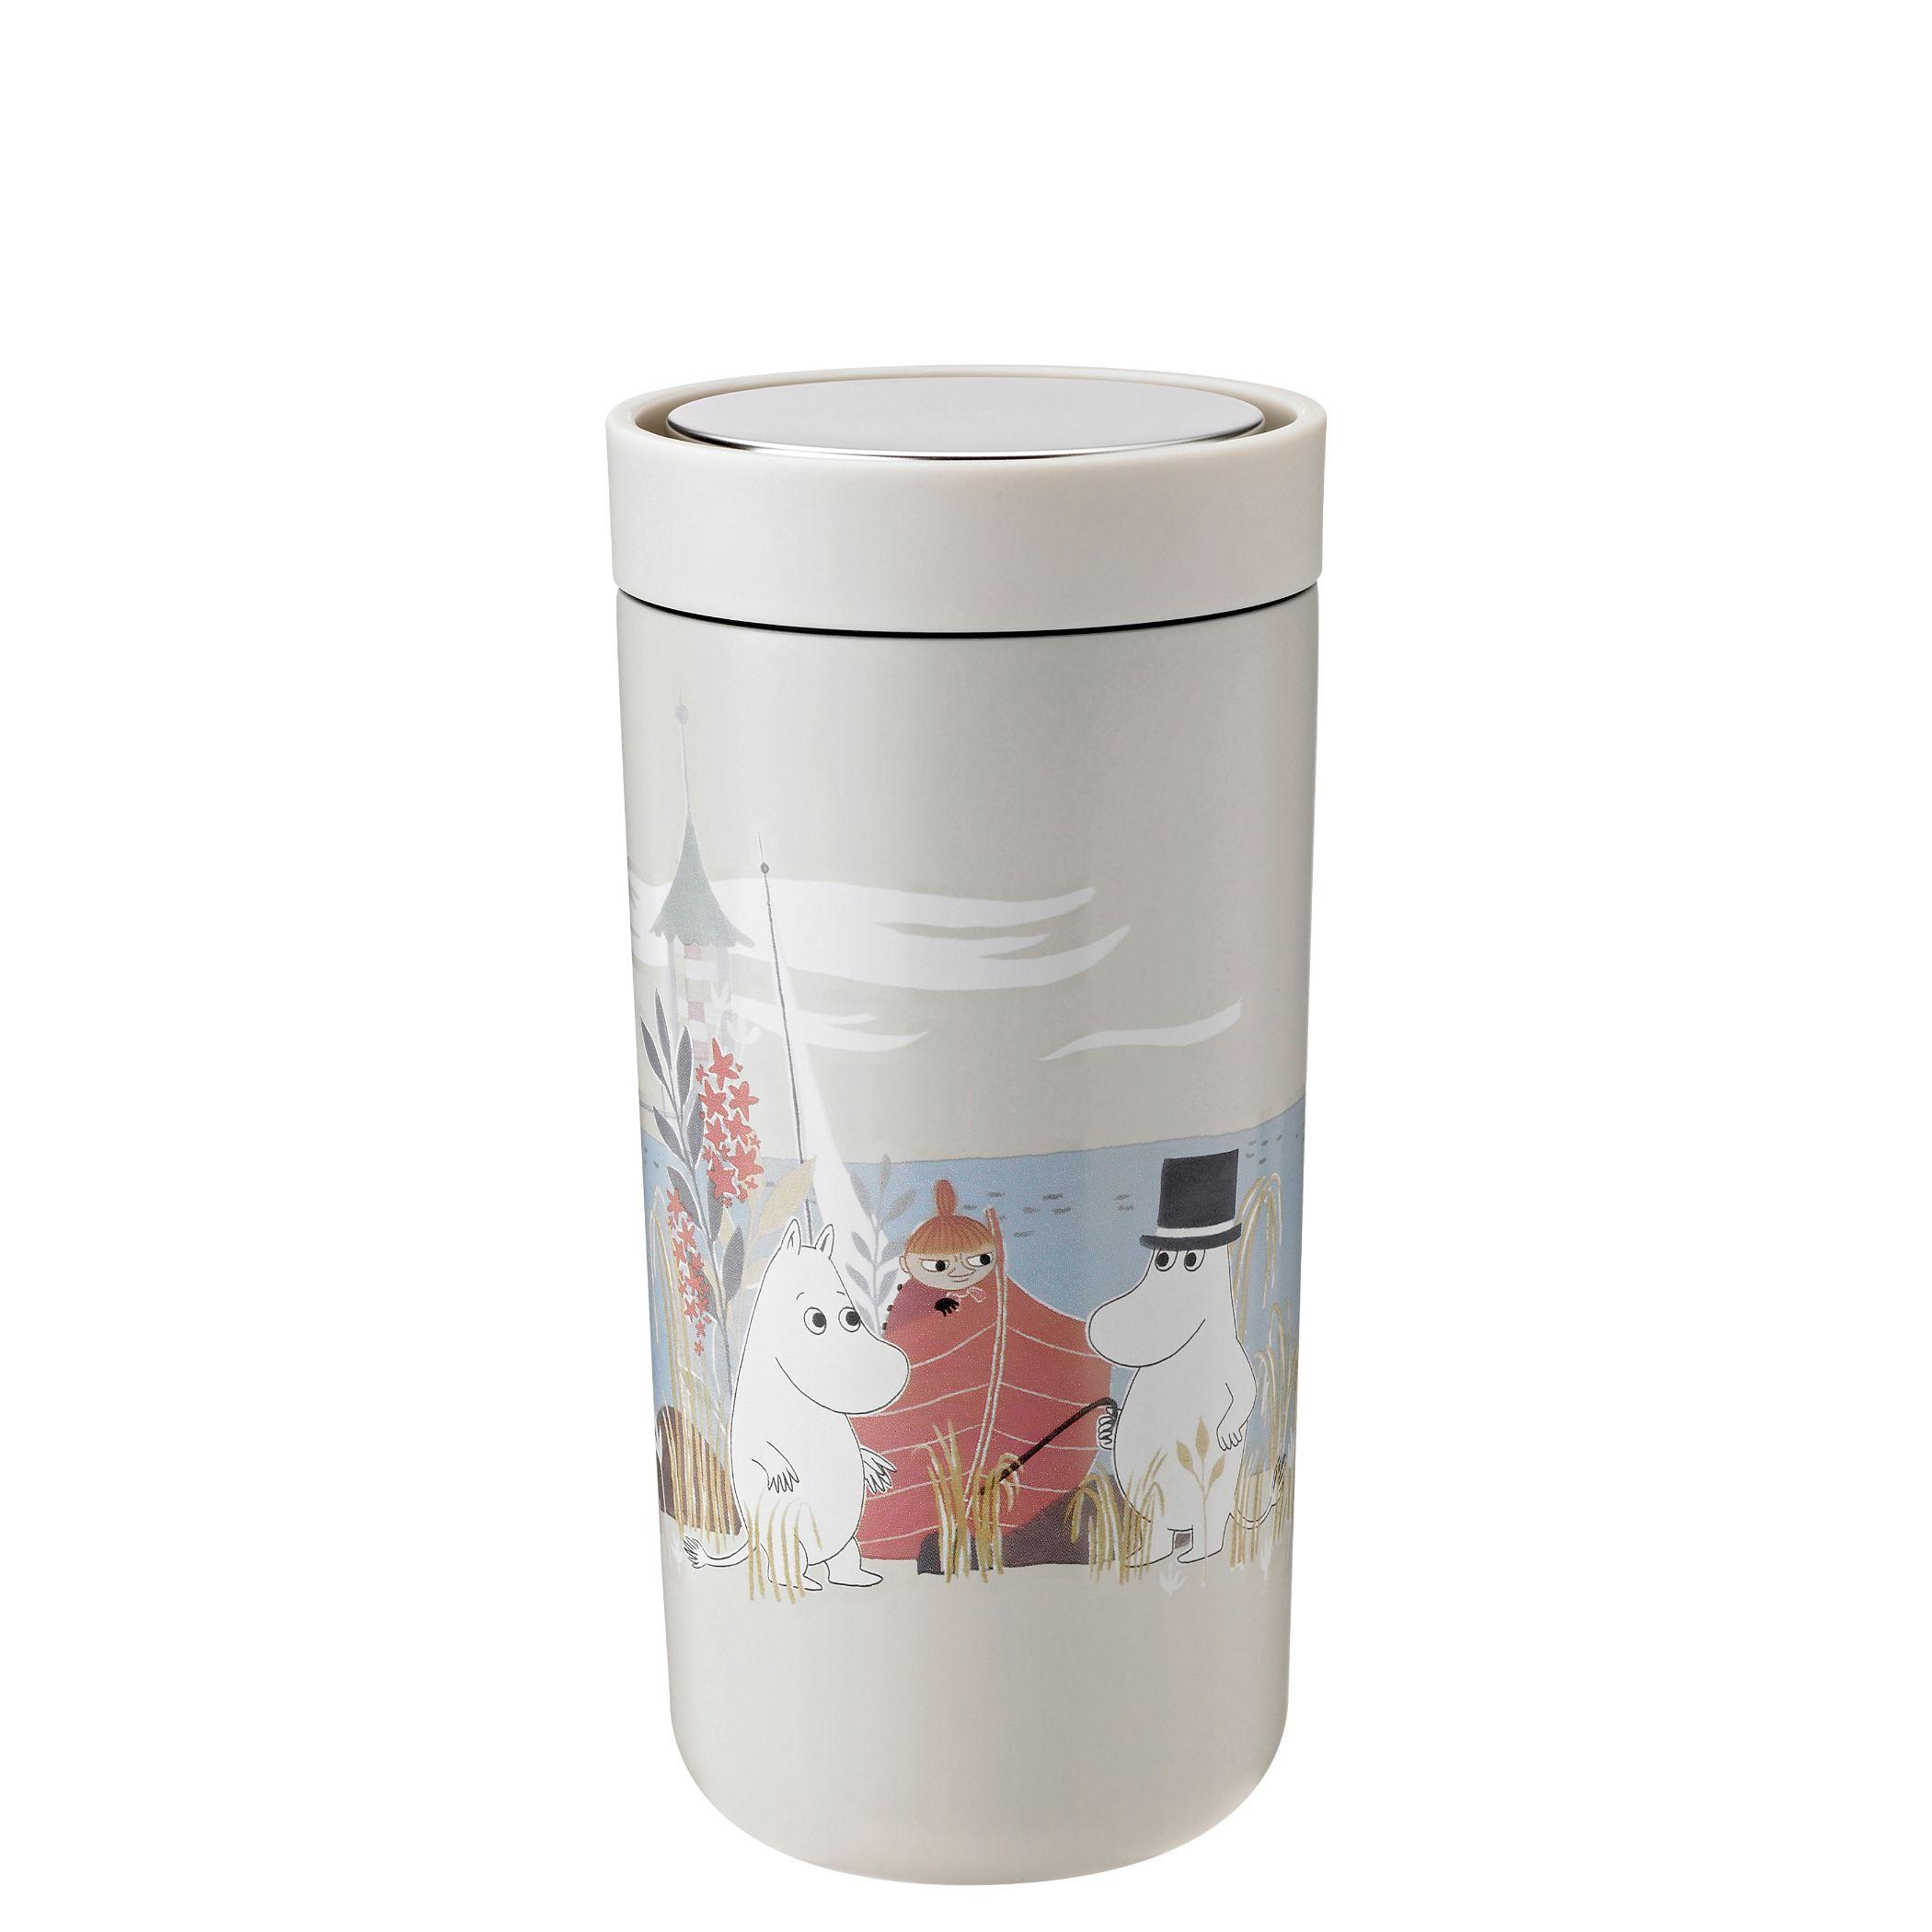 Stelton Mumi To Go Click kop, 400 ml